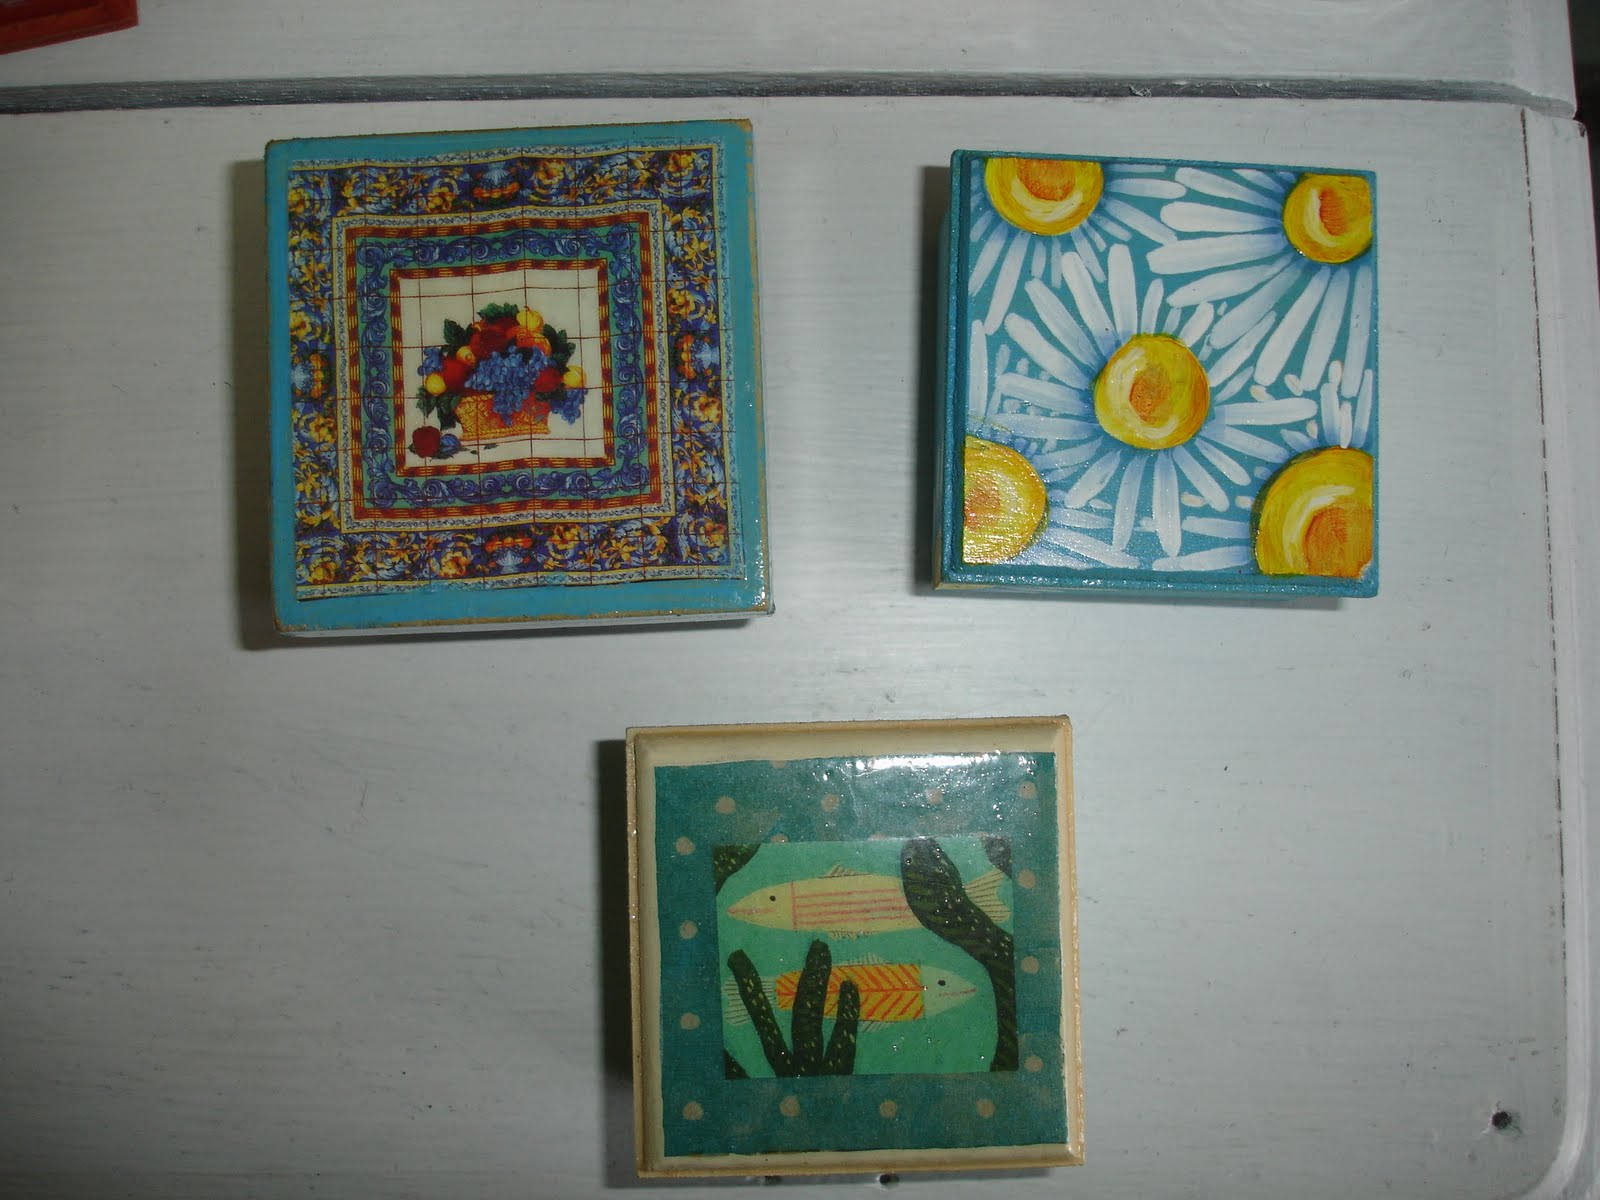 Coraz n contento cajitas de madera decoupage y pintura for Pintura para decoupage